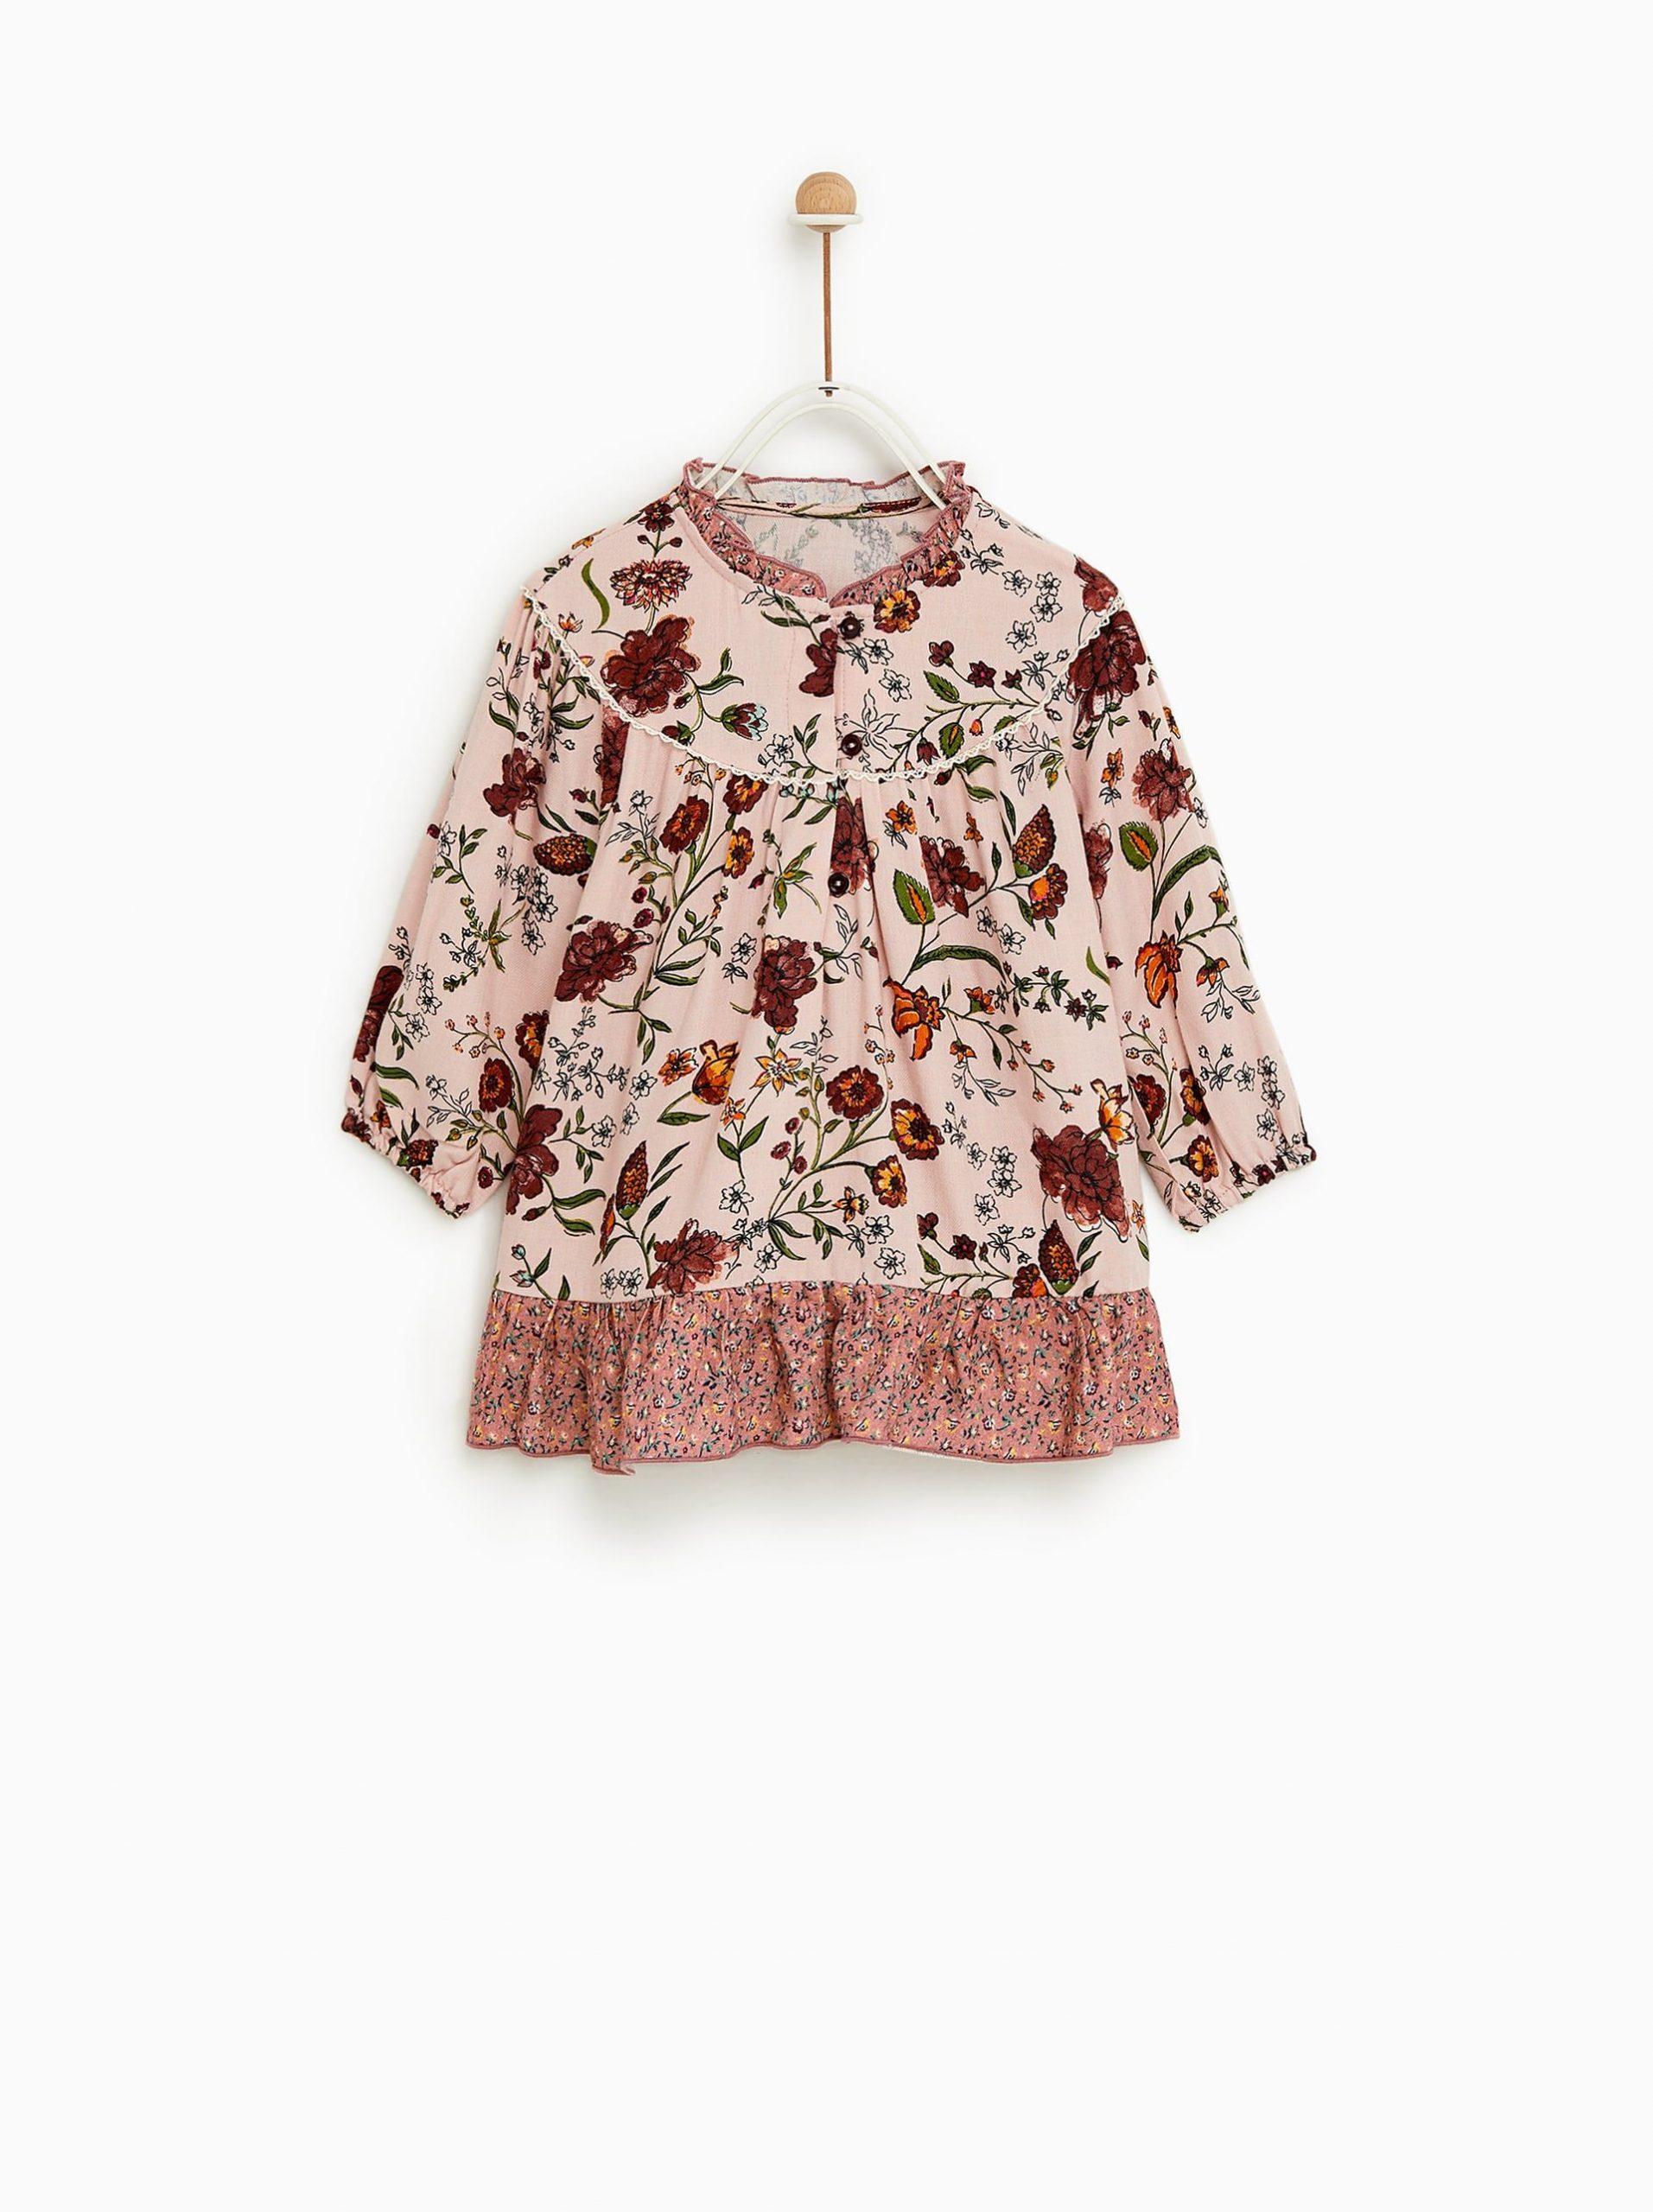 Zara  Kids  Floral Dress  Kinder Kleidung